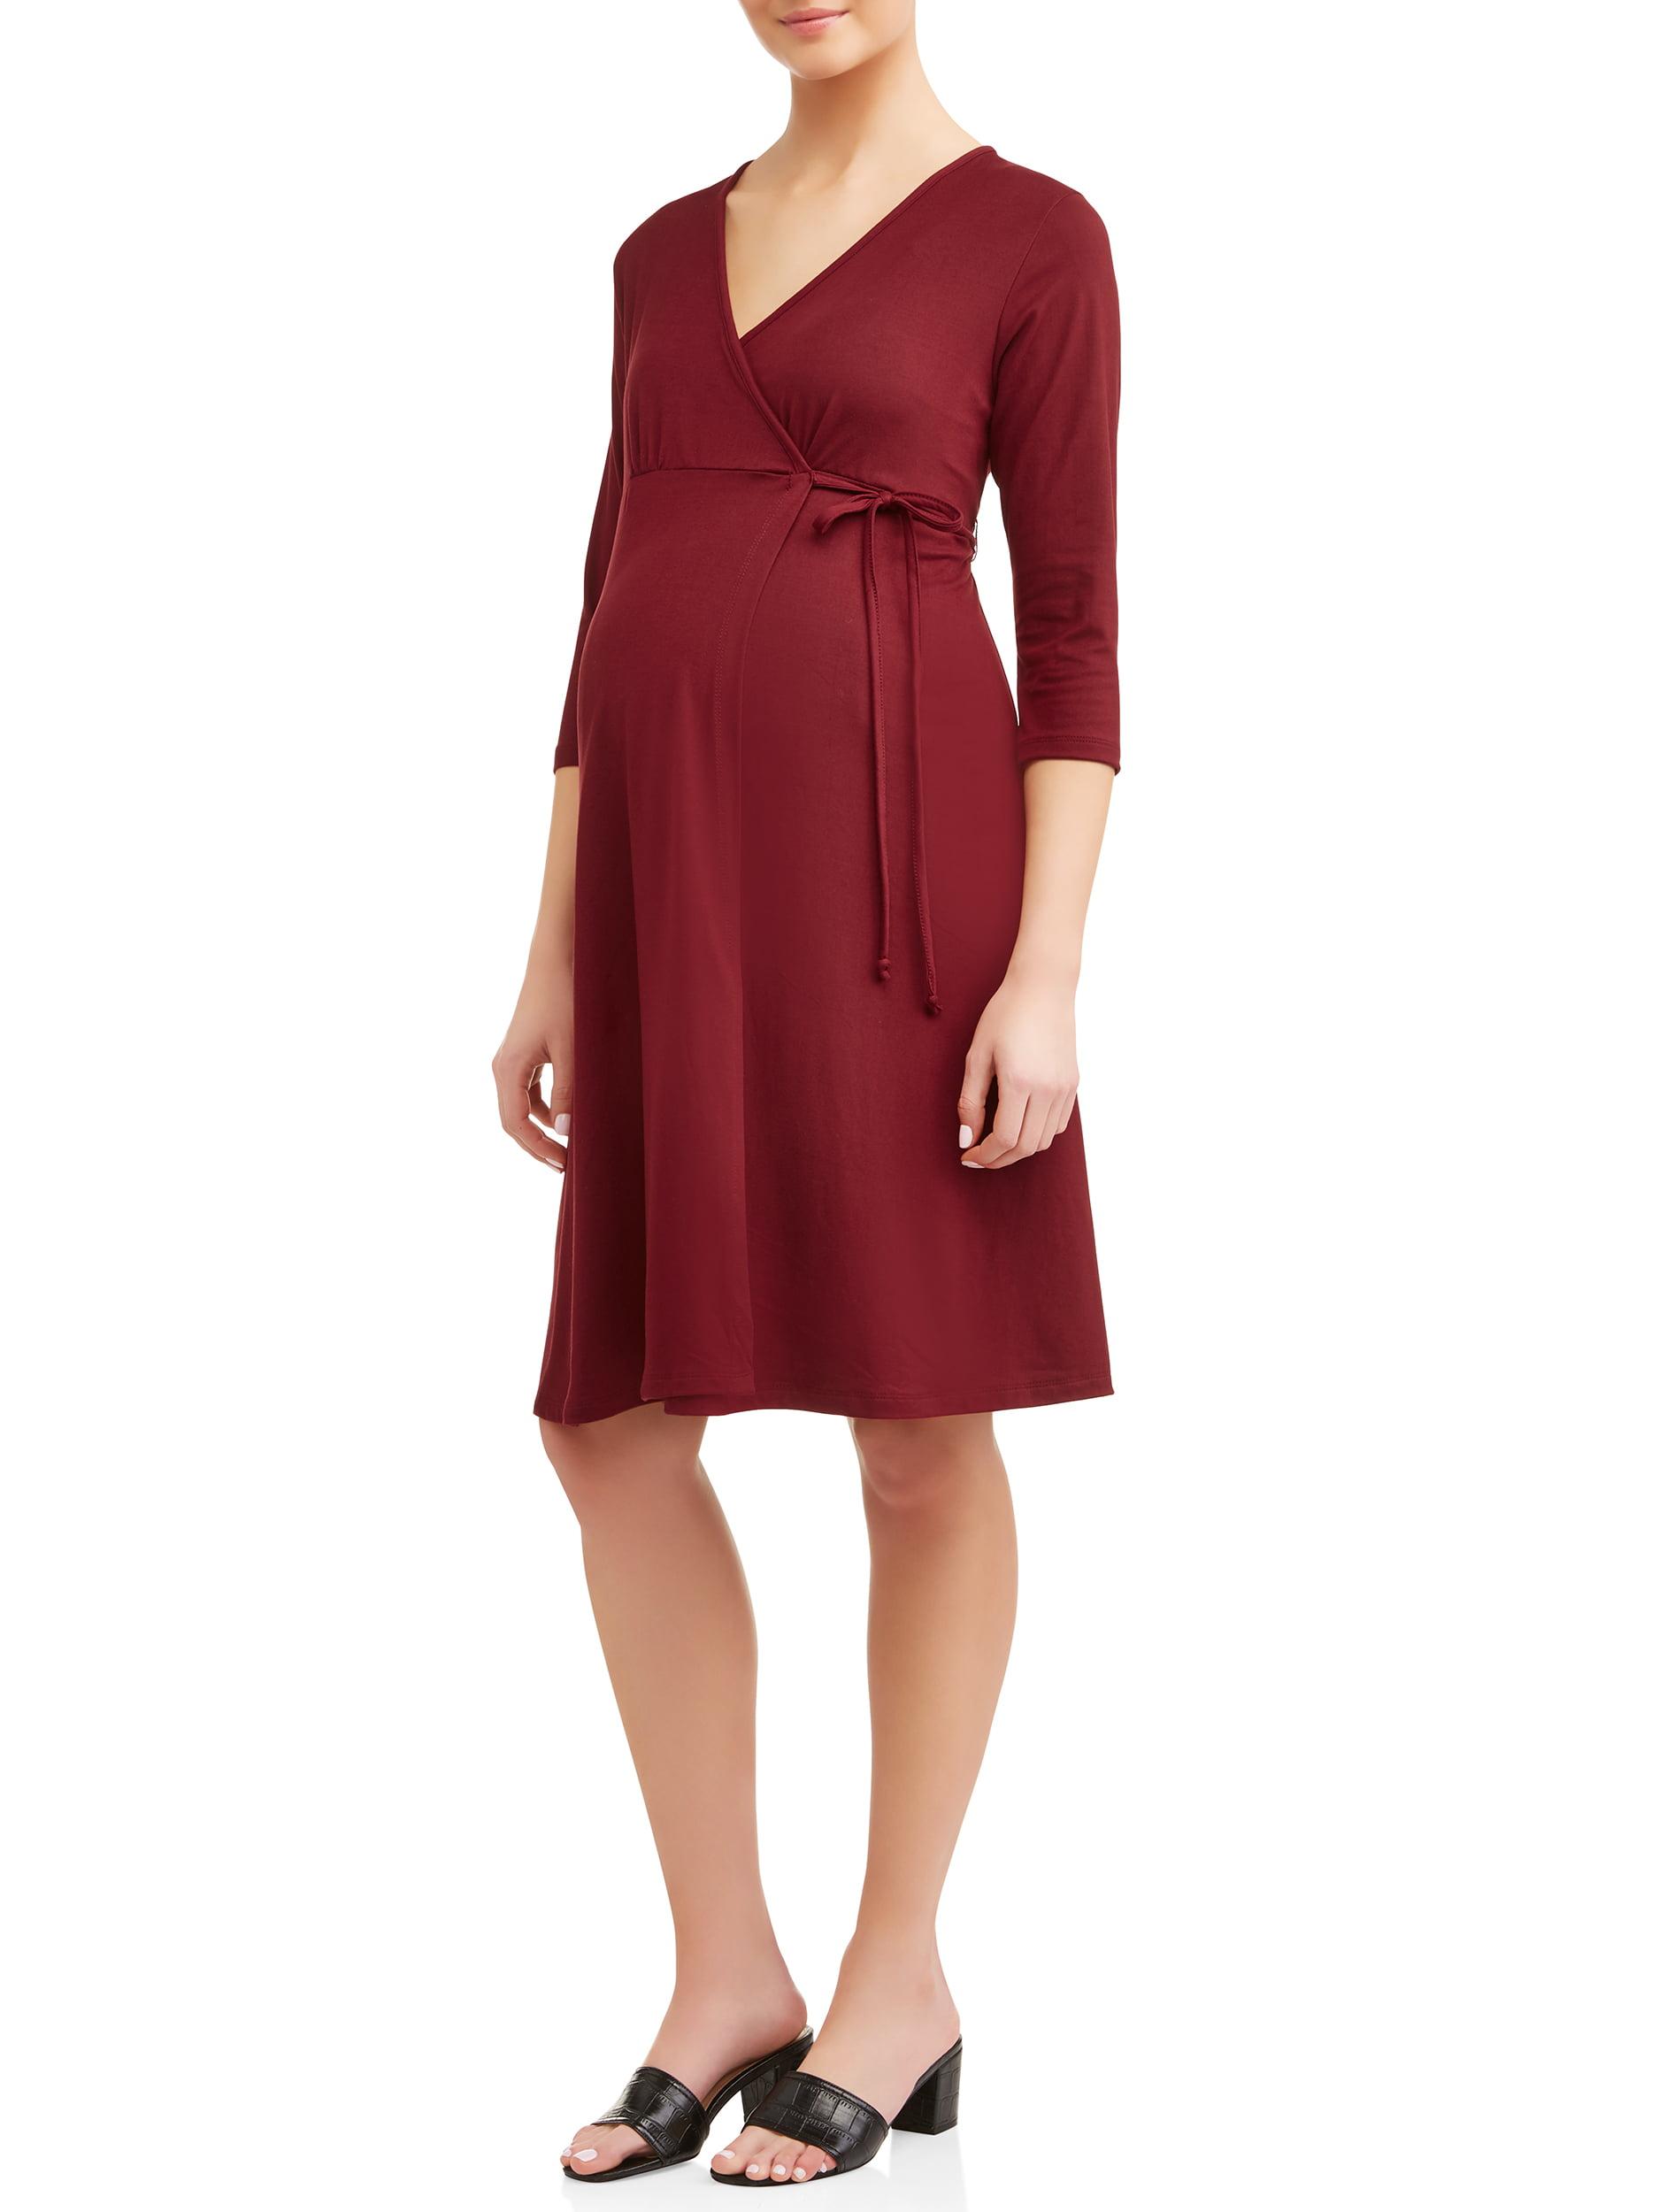 Maternity Nursing Friendly 3/4 Sleeve Wrap Dress